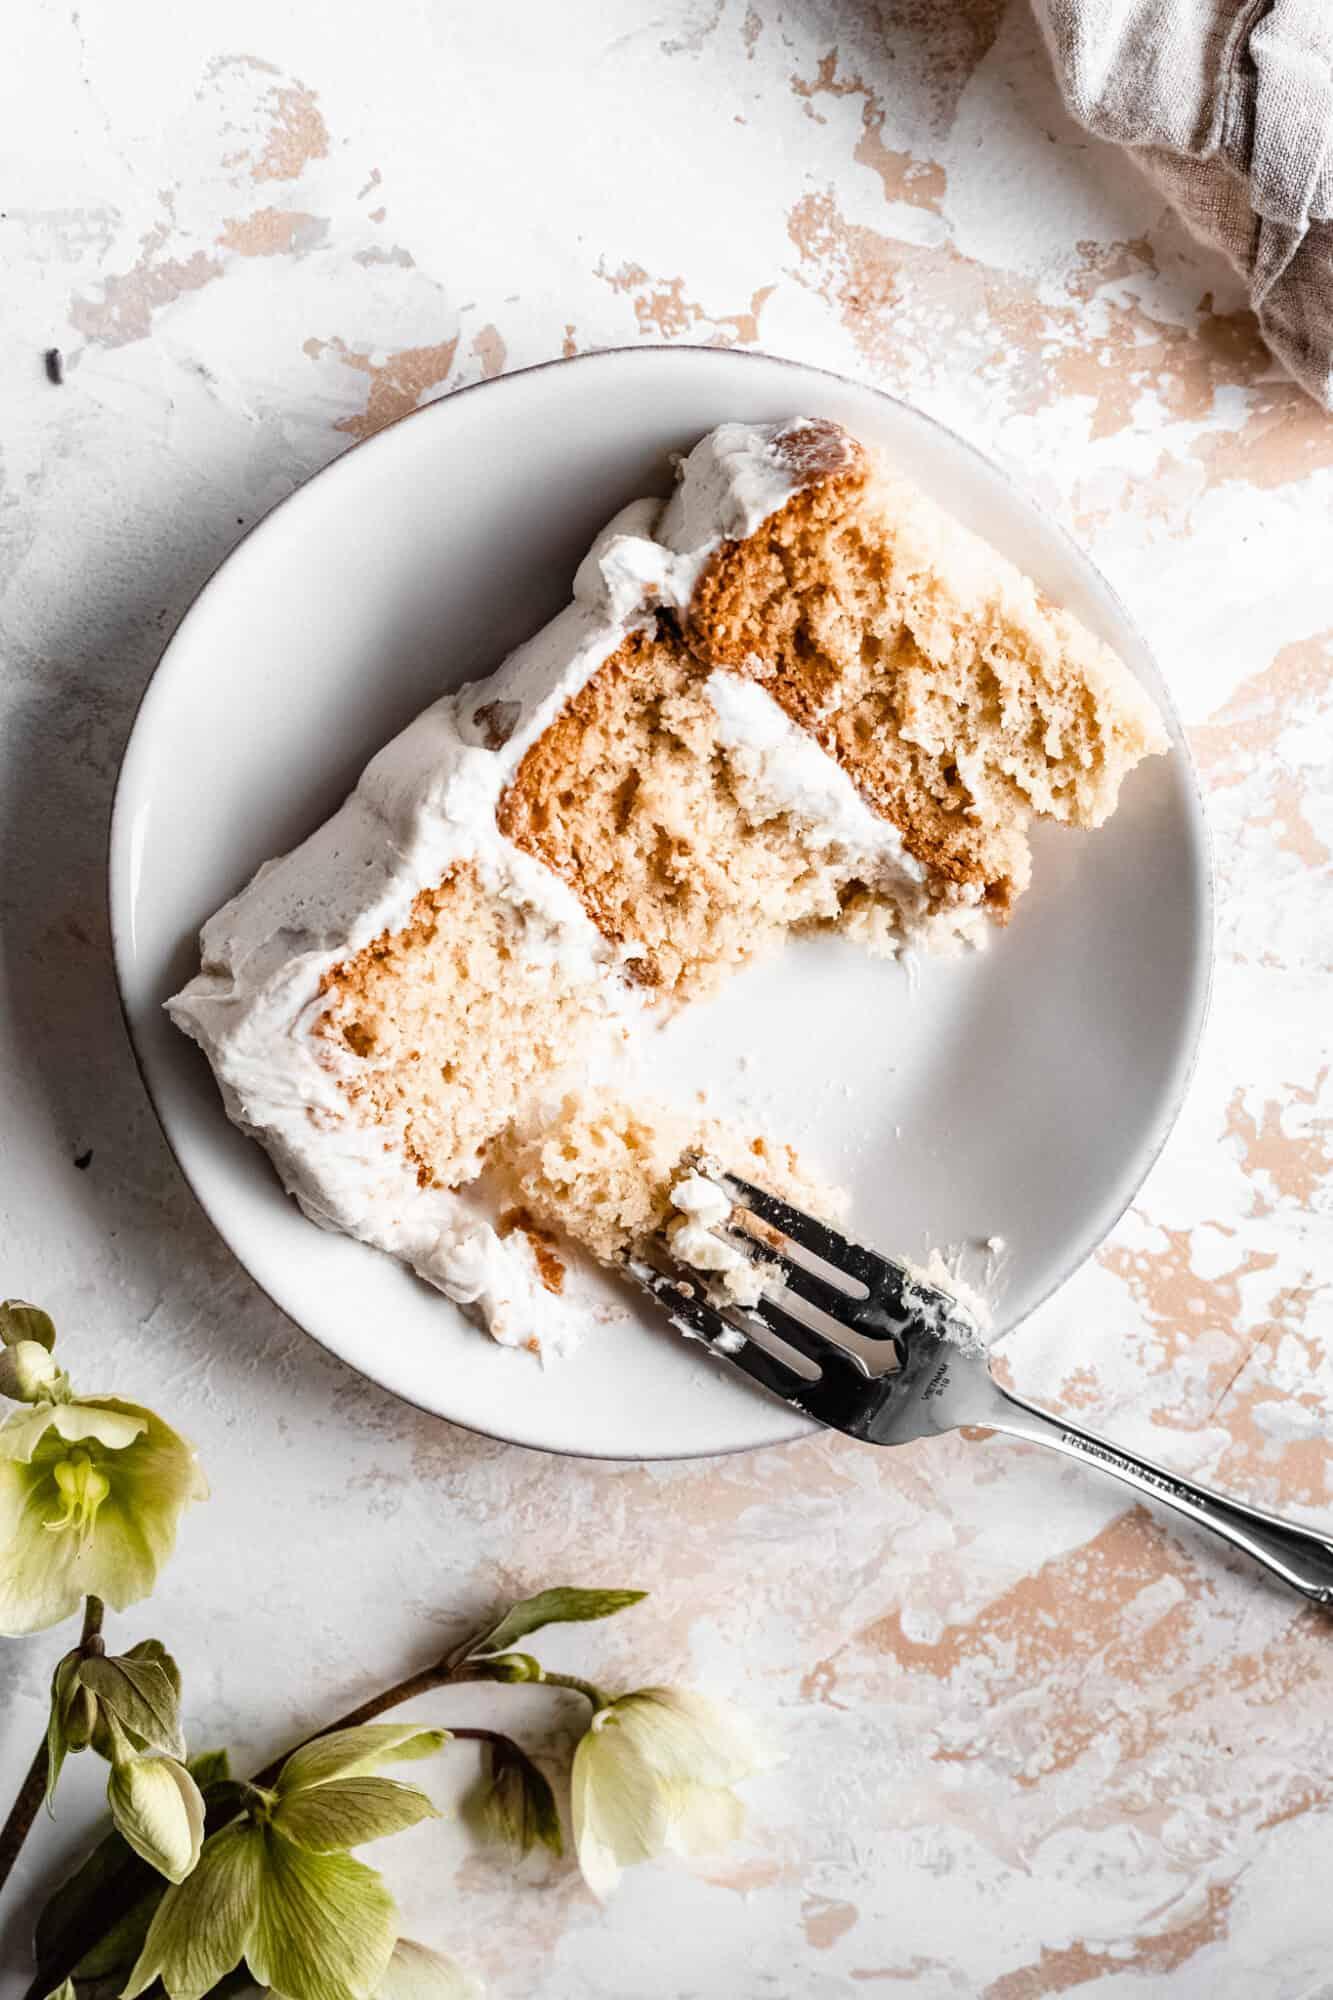 slice of vegan vanilla cake with bite taken from it